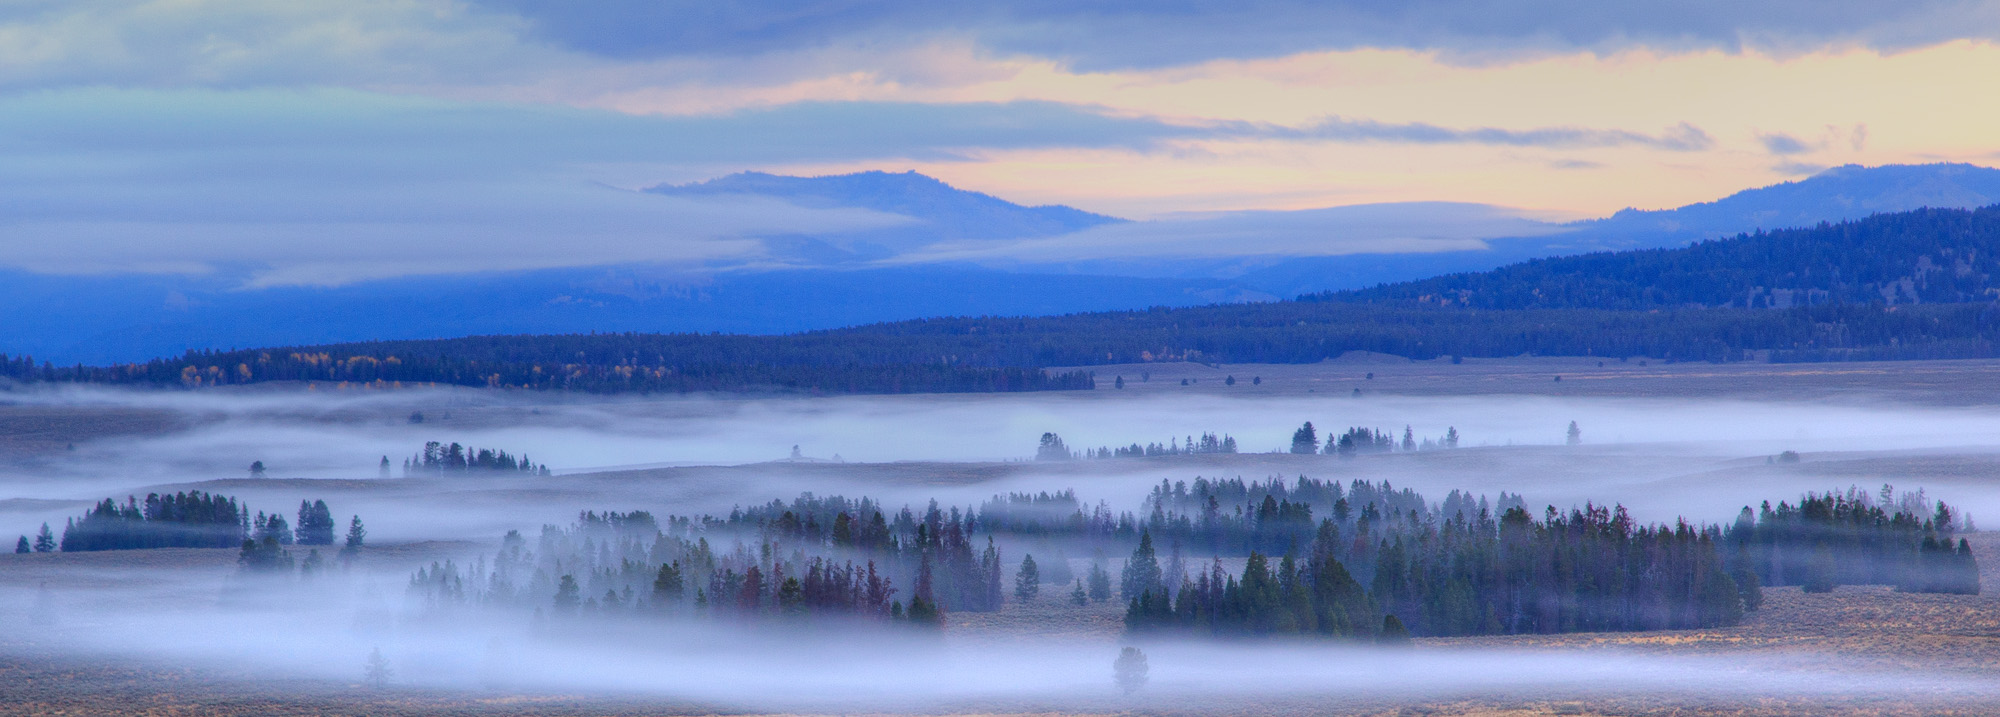 Grand Teton at dawn.